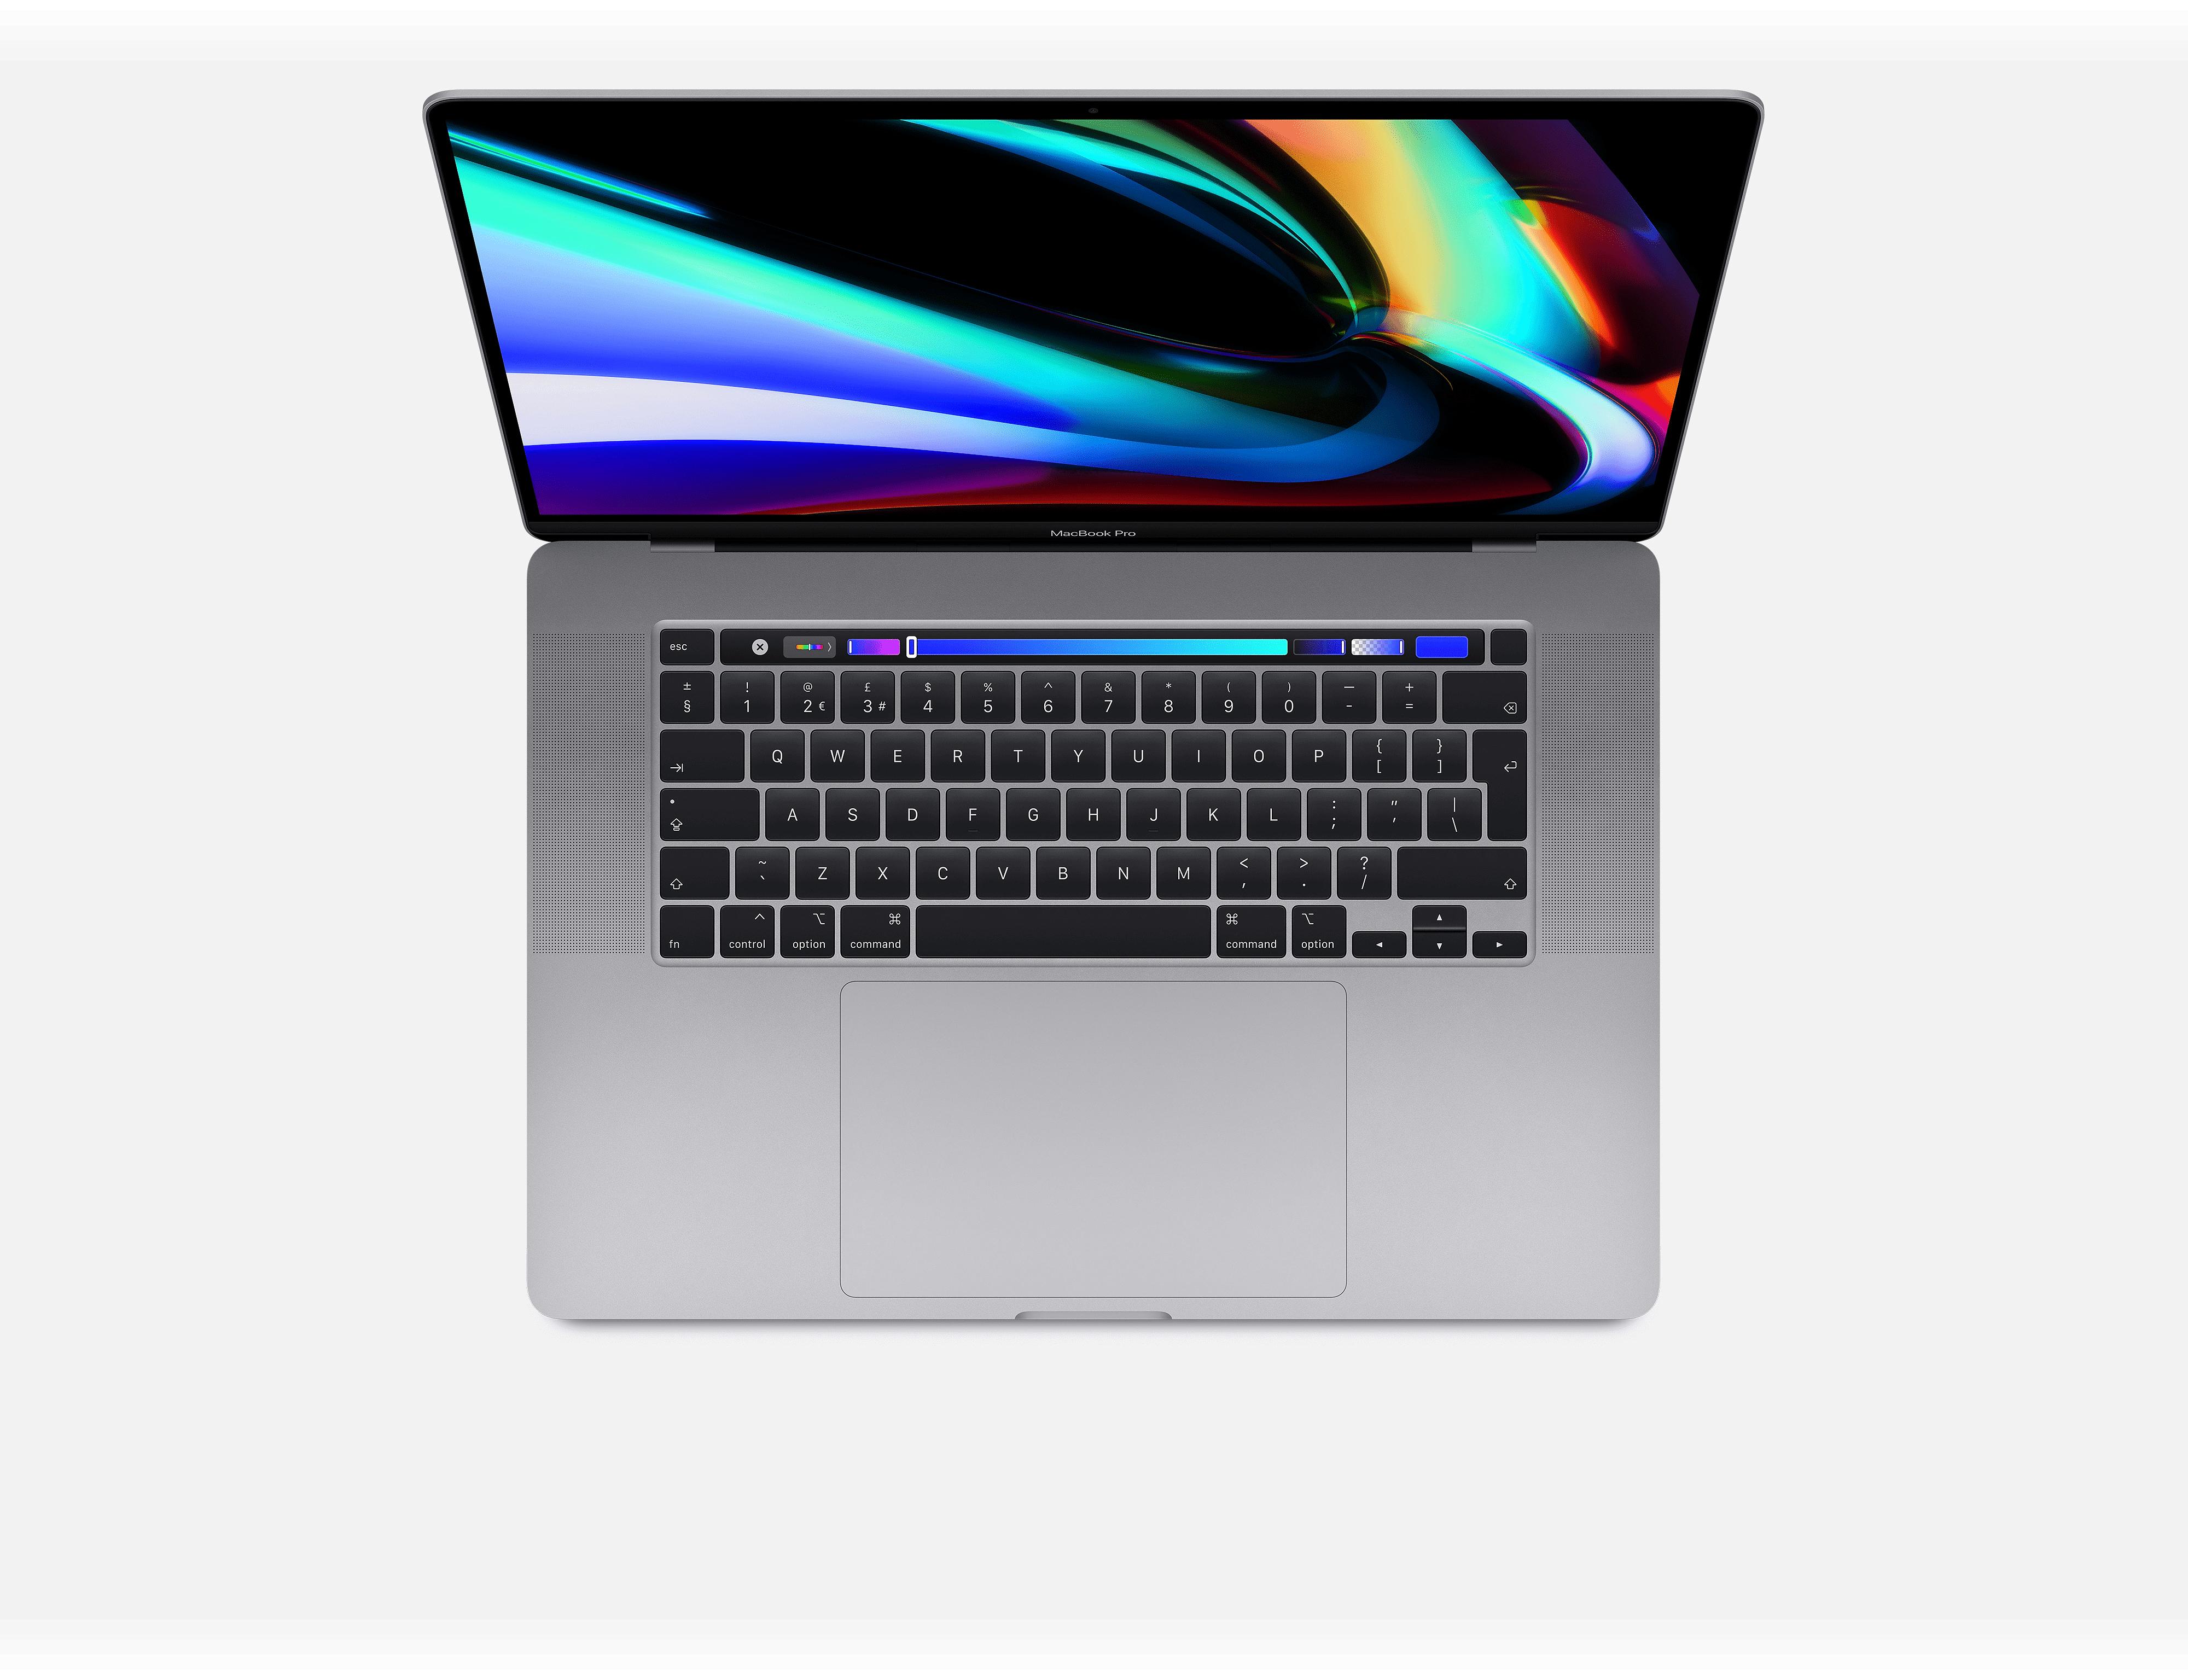 Apple Macbook Pro, Intel Core i7, 16GB RAM, 512GB Solid State Drive, 16 Inch Notebook